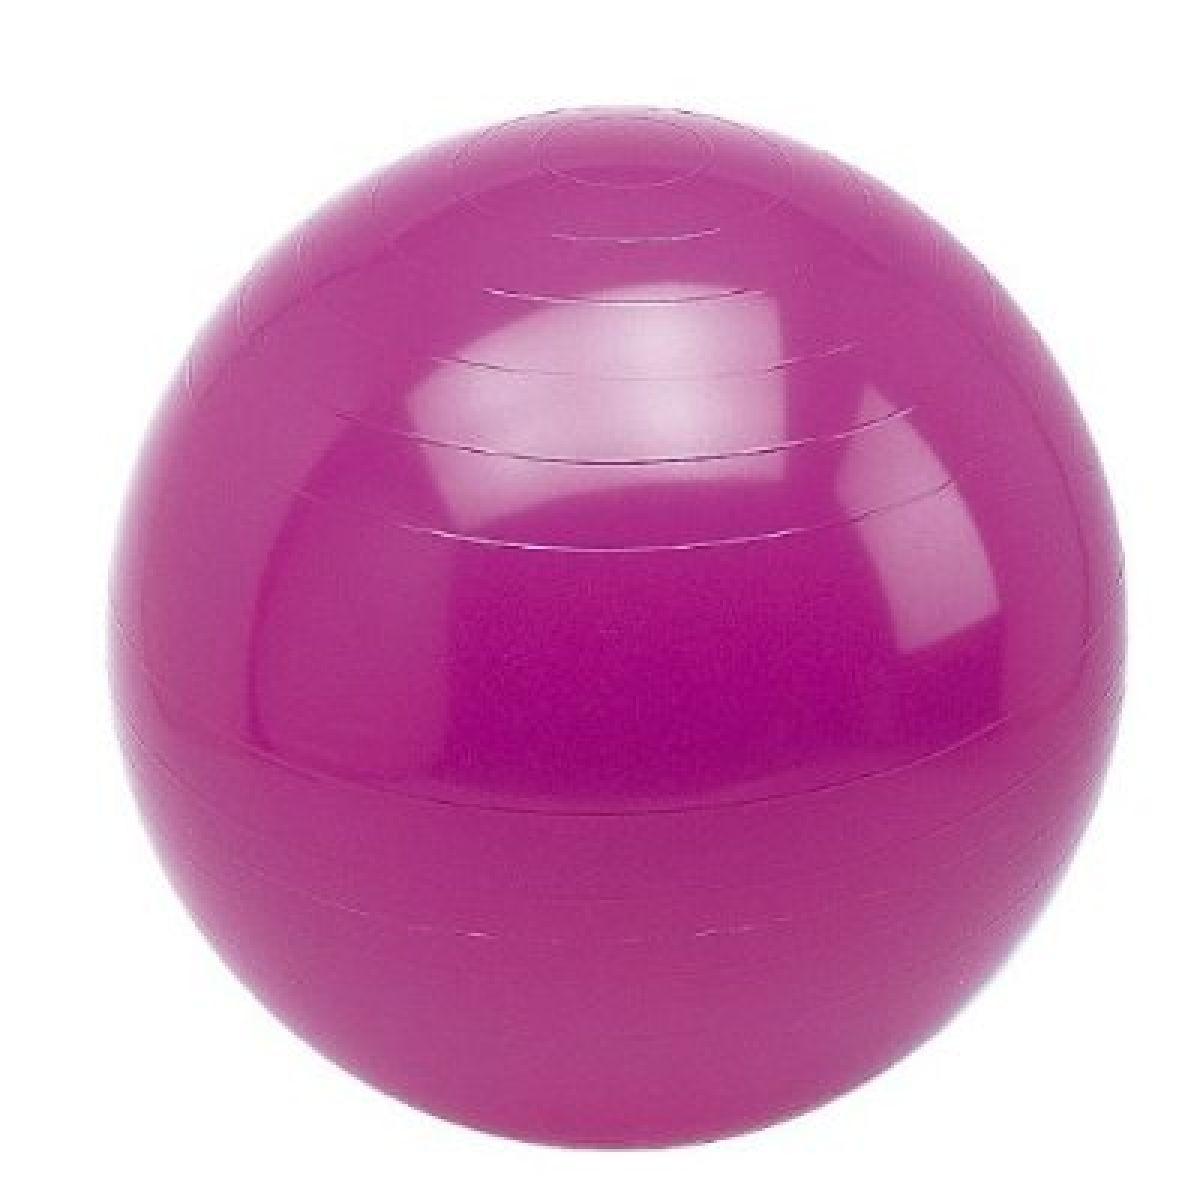 John Gymnastický míč Standart 65cm